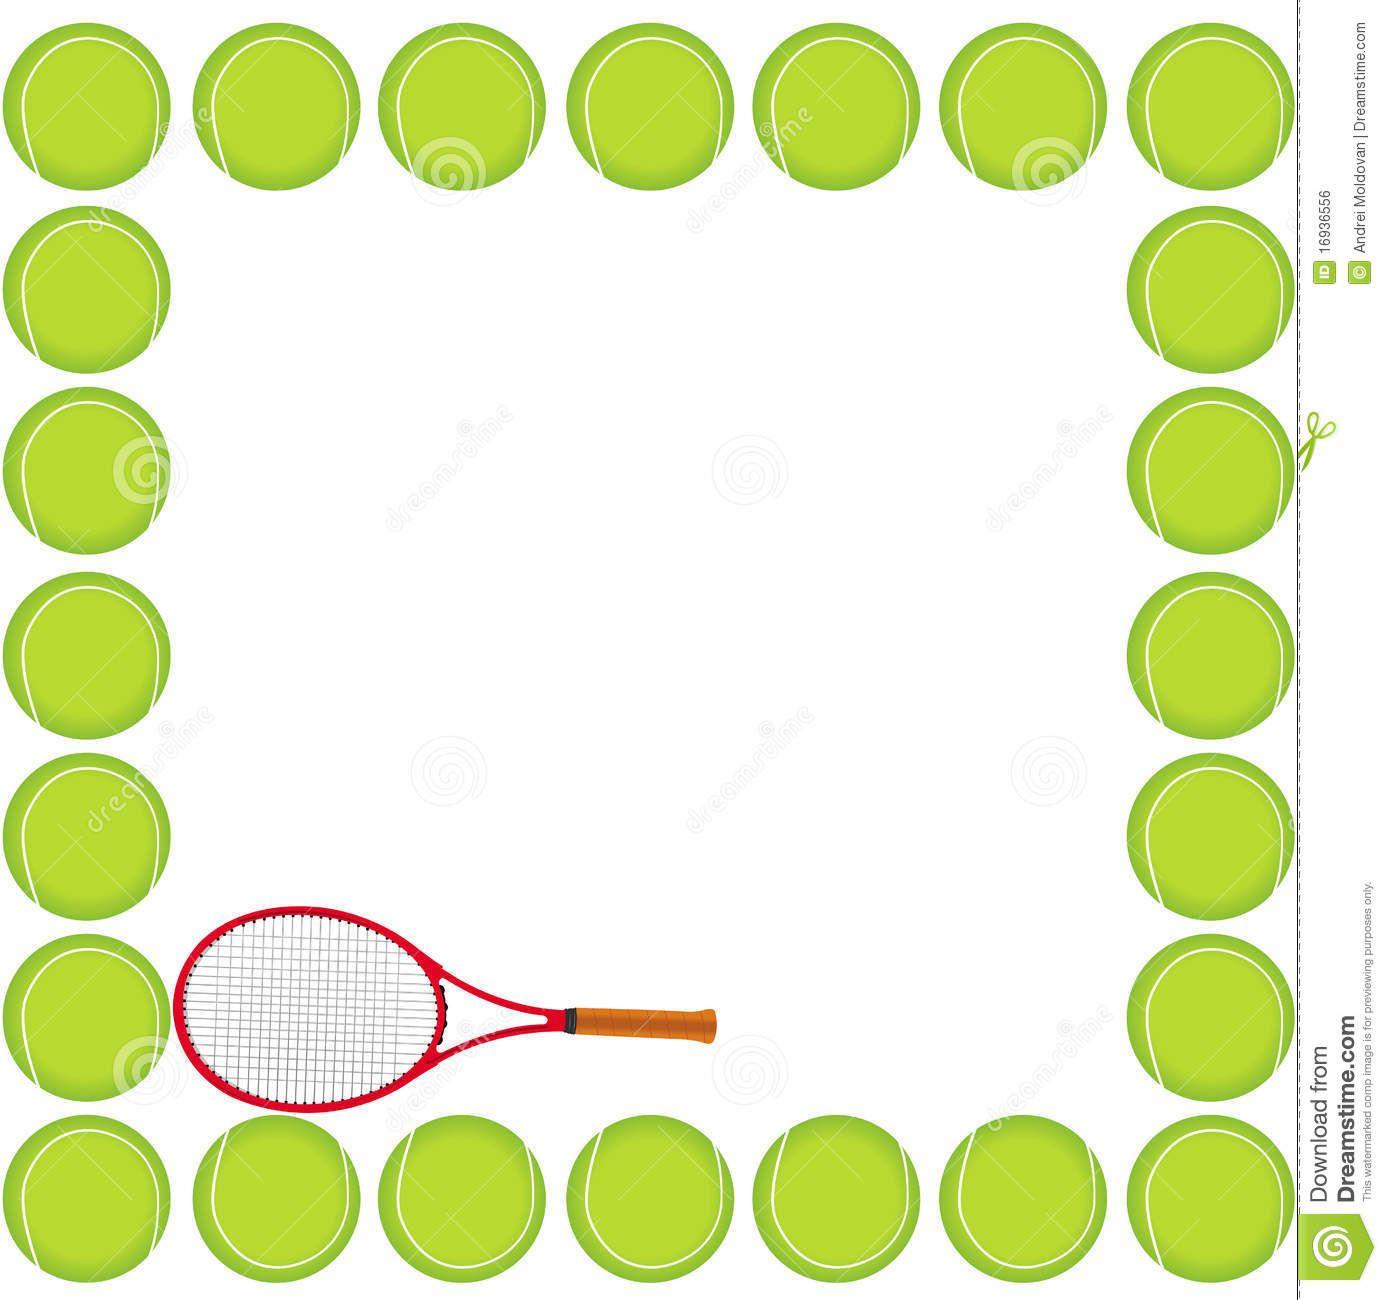 Tennis Borders Free Clipart.